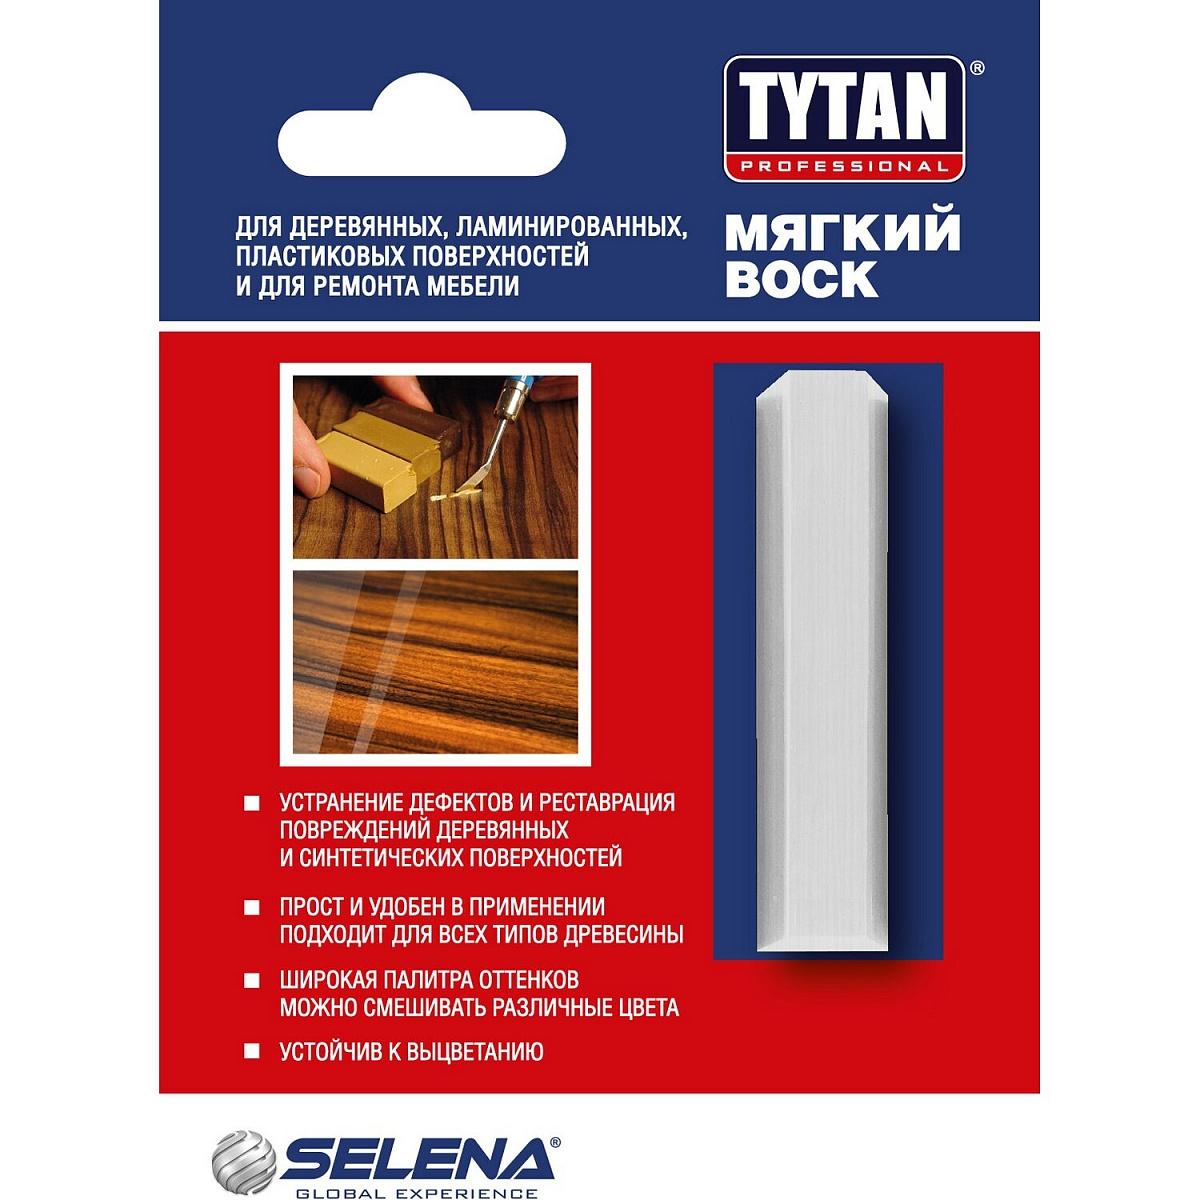 Воск TYTAN Professional мягкий цв.62 махагон, 7.5г